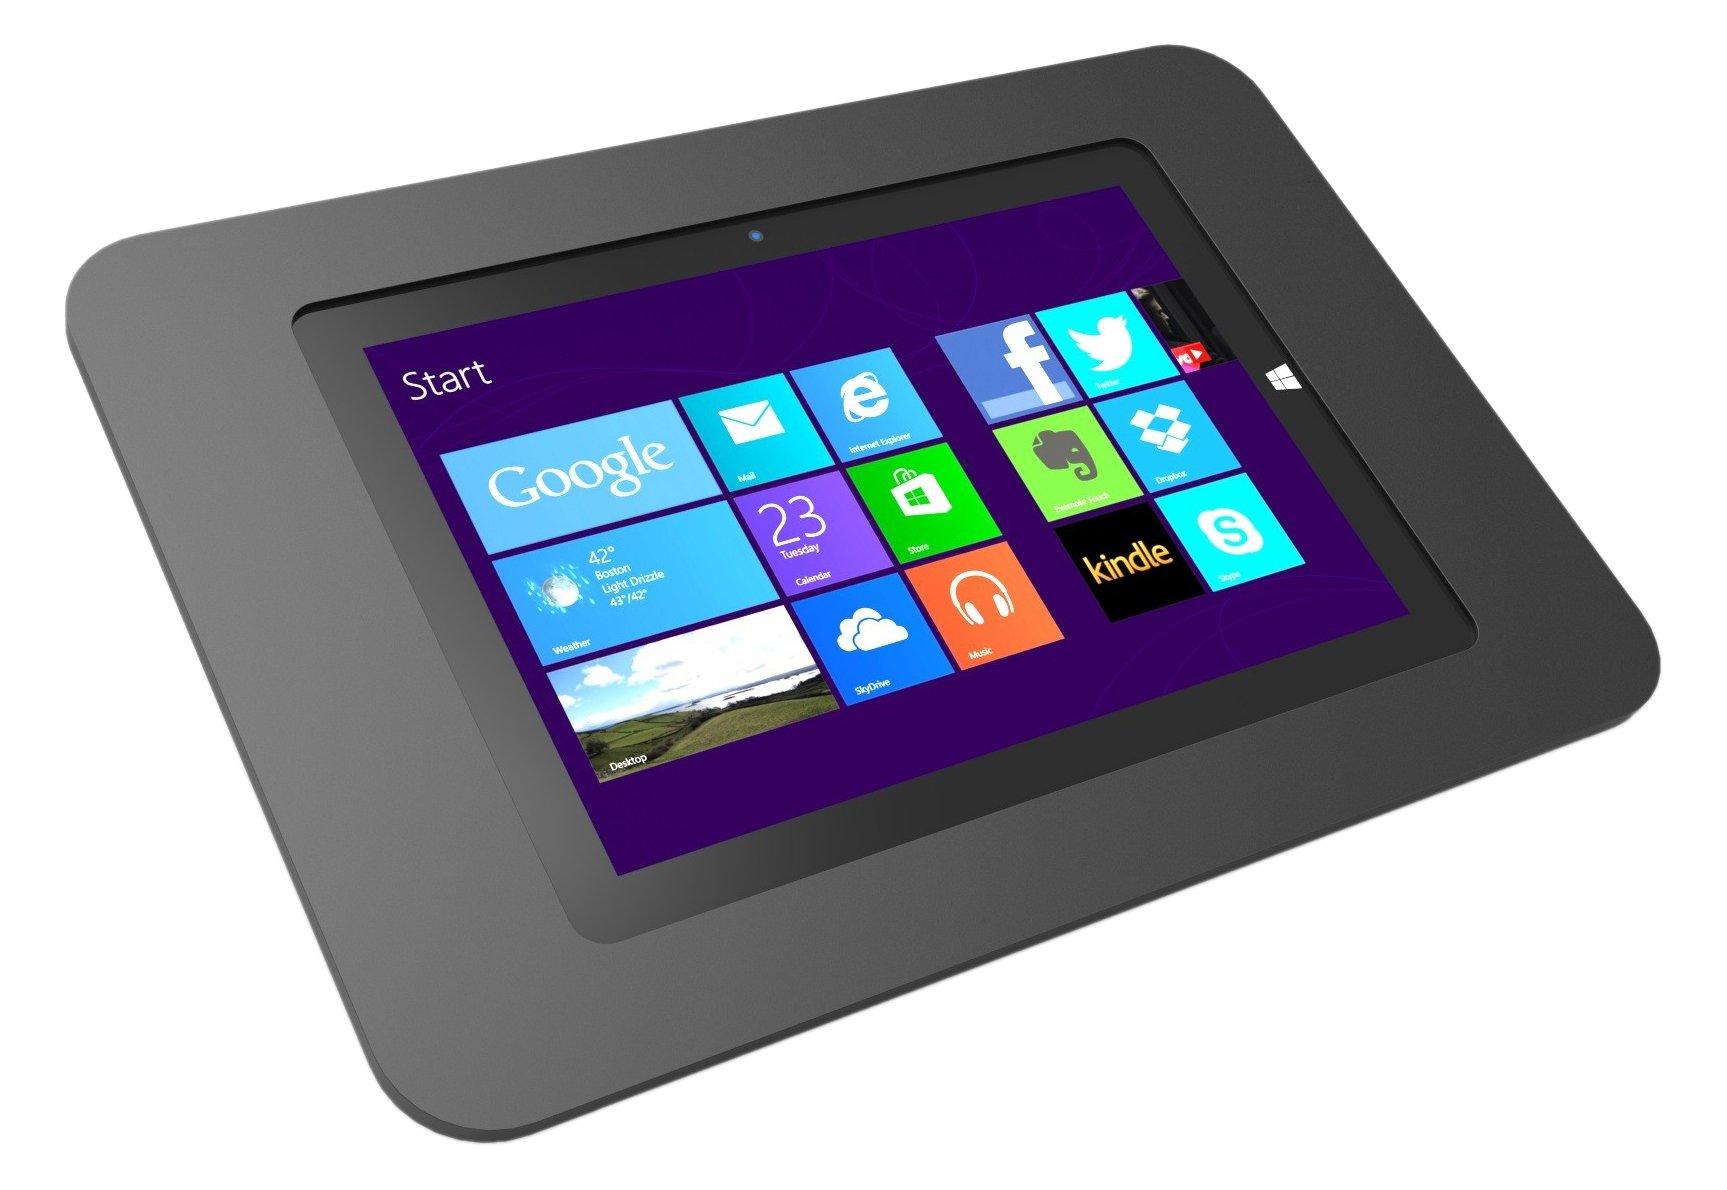 Maclocks 340B518ROKB Rokku Secure Enclosure Capsule Kiosk for Surface 3 10.8 Inch (Black)